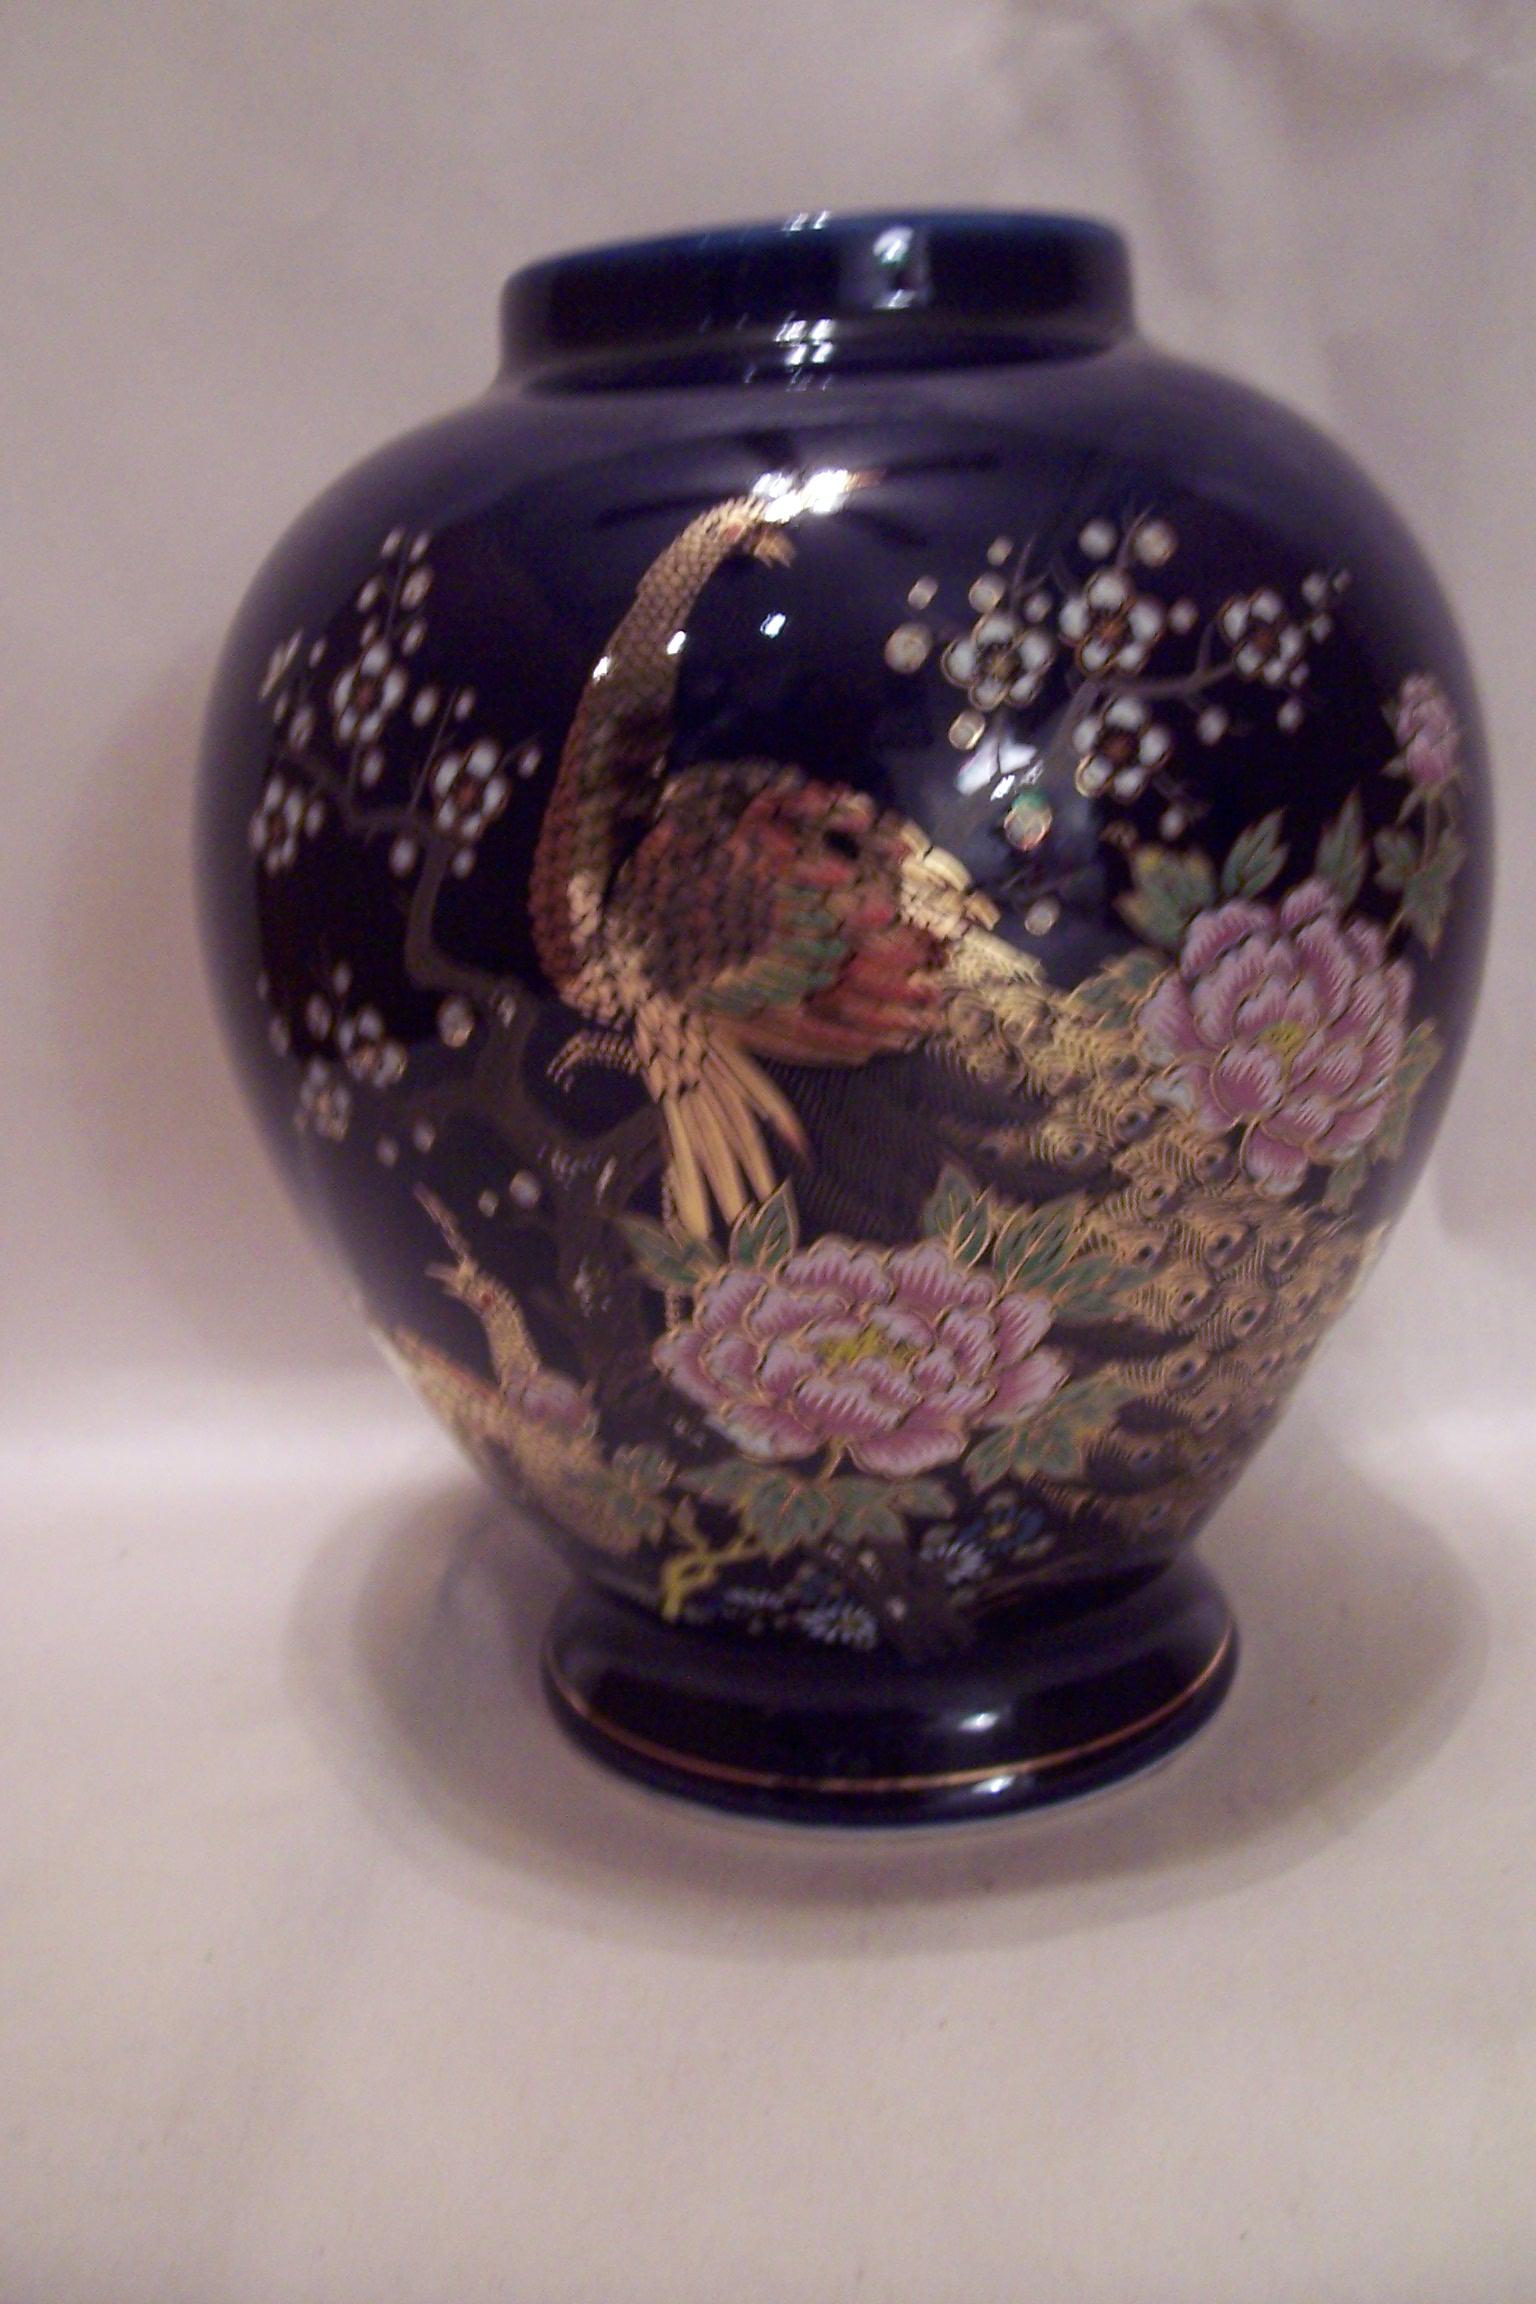 Japanese cobalt blue porcelain peacock vase porcelain and pottery japanese cobalt blue porcelain peacock vase porcelain and pottery made in japan at bgs classic art pottery ceramics reviewsmspy